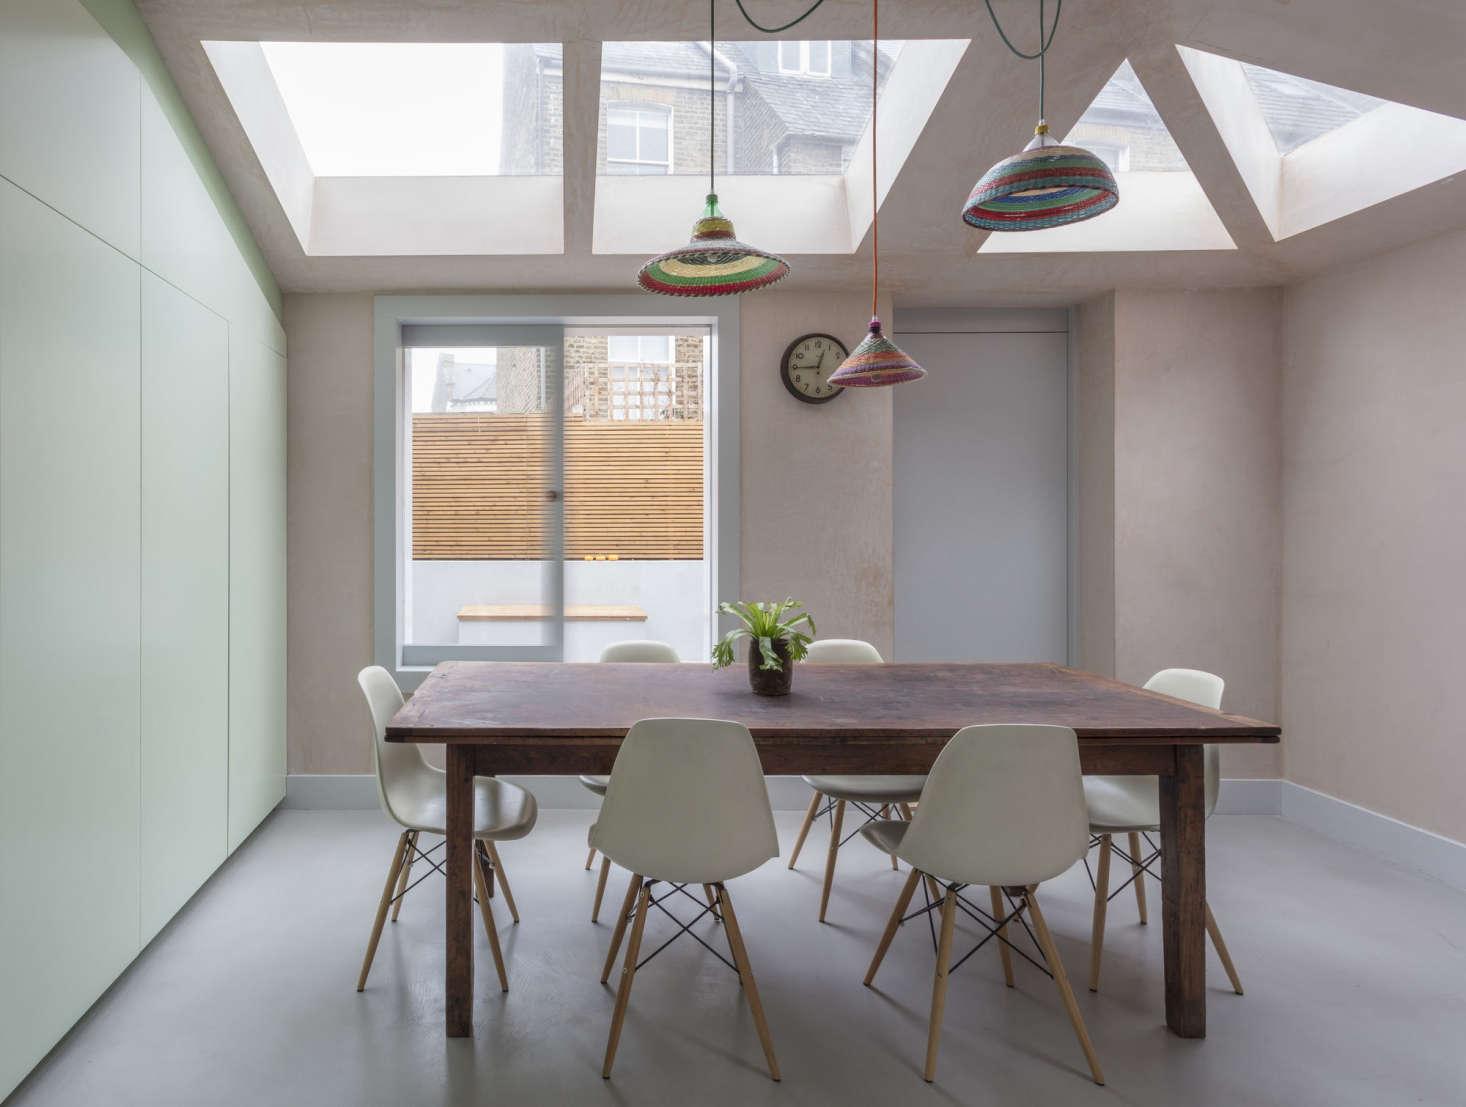 Photograph byNicholas Worley, courtesy ofSimon Astridge Architecture Workshop, from Kitchen of the Week: Urban Tropical, A Simon Astridge Kitchen Addition.